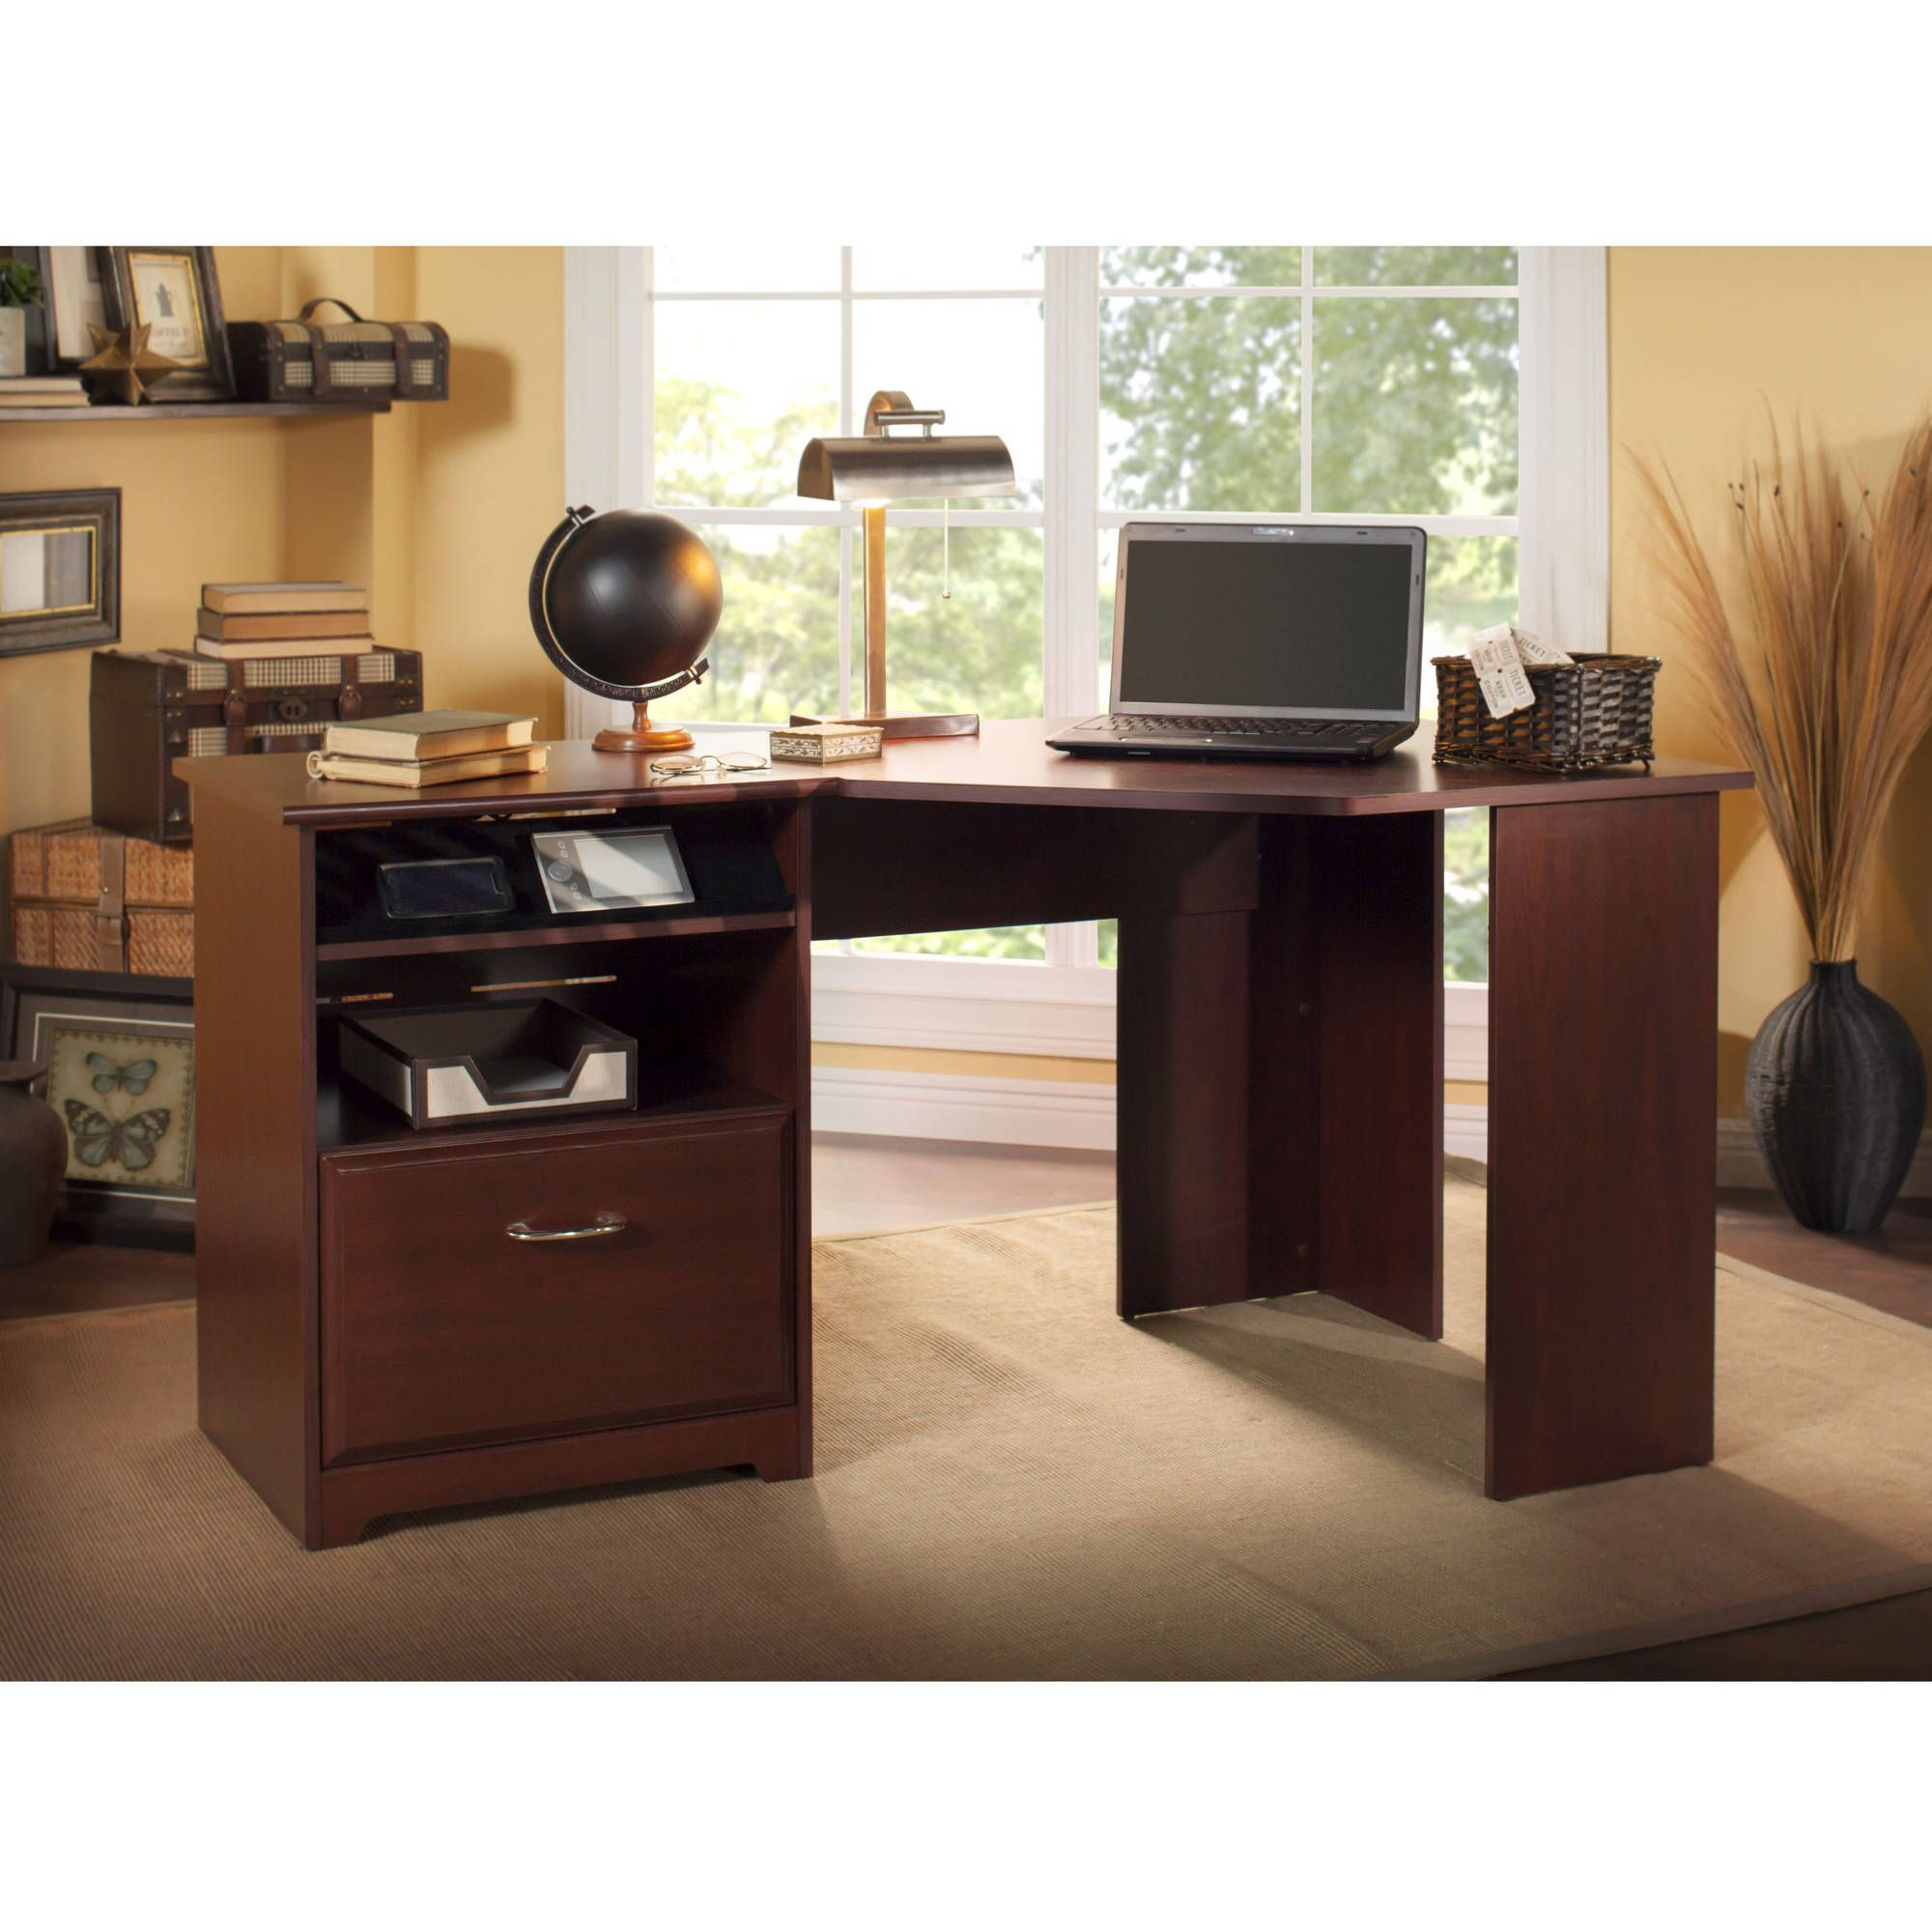 99 Black Corner Desk Walmart Large Home Office Furniture Check More At Http Www Sewcraftyjenn Com Black Corn With Images Corner Computer Desk Bush Furniture Furniture